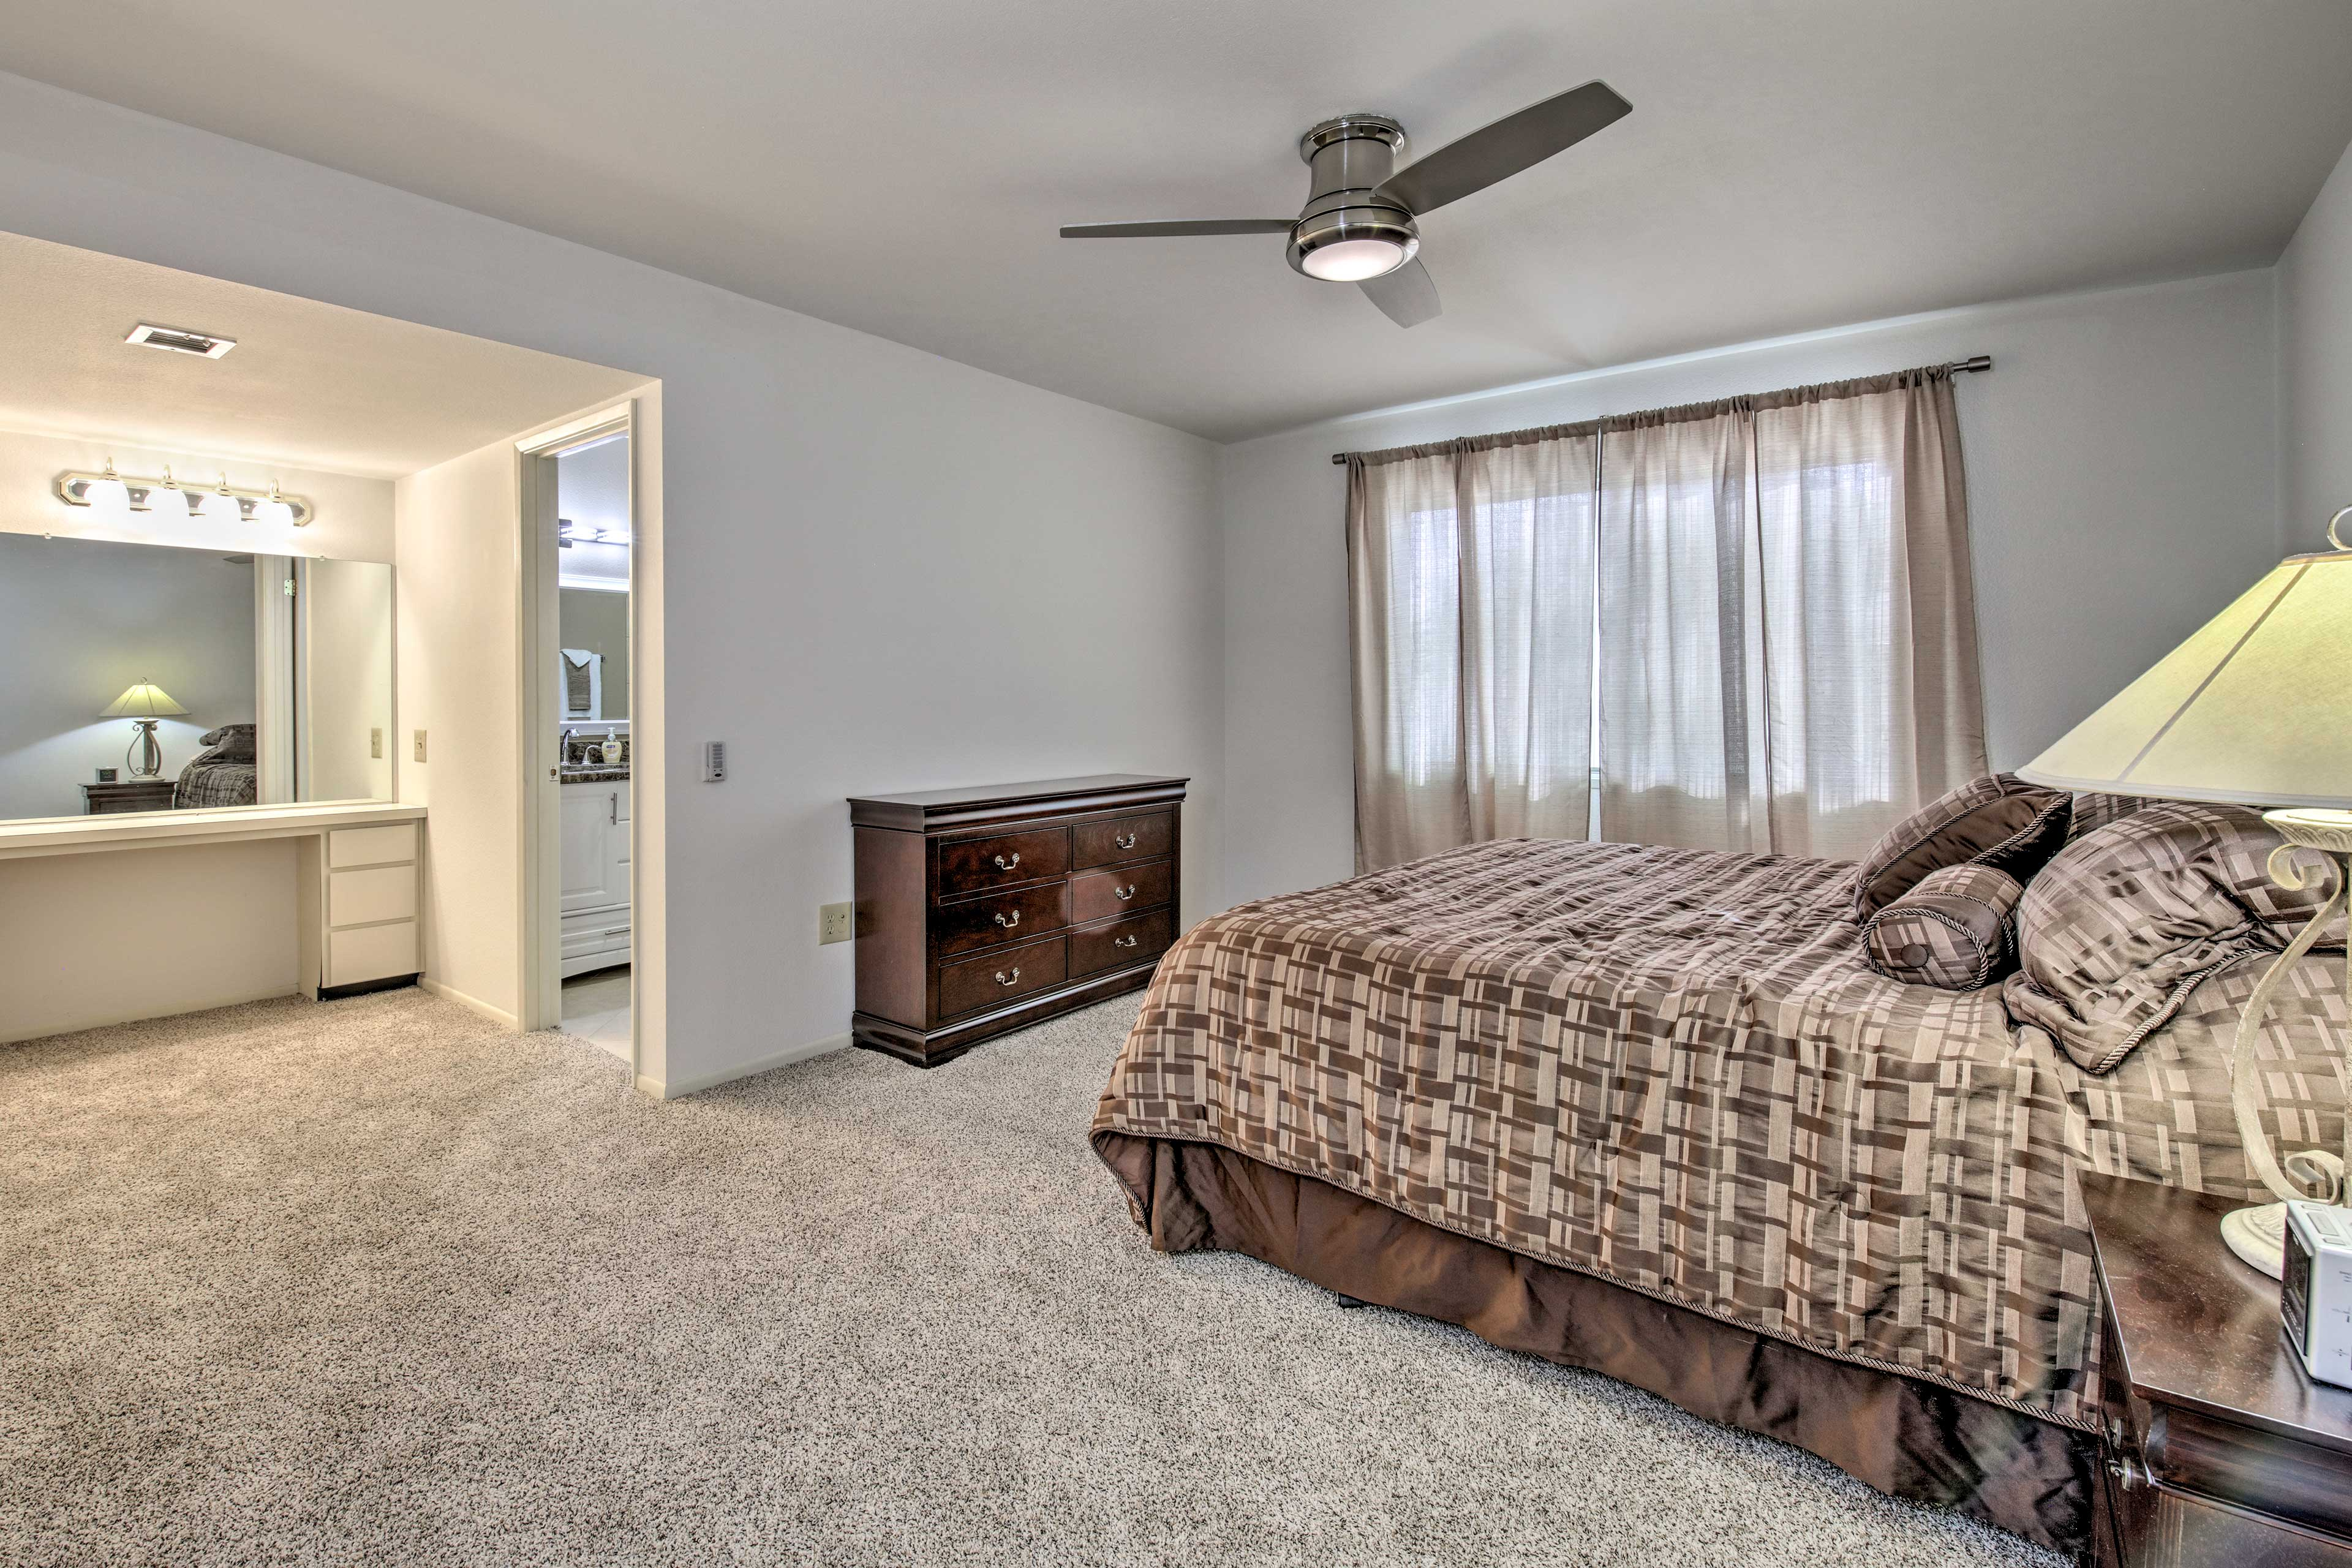 The master bedroom hosts a king bed and en-suite bathroom.